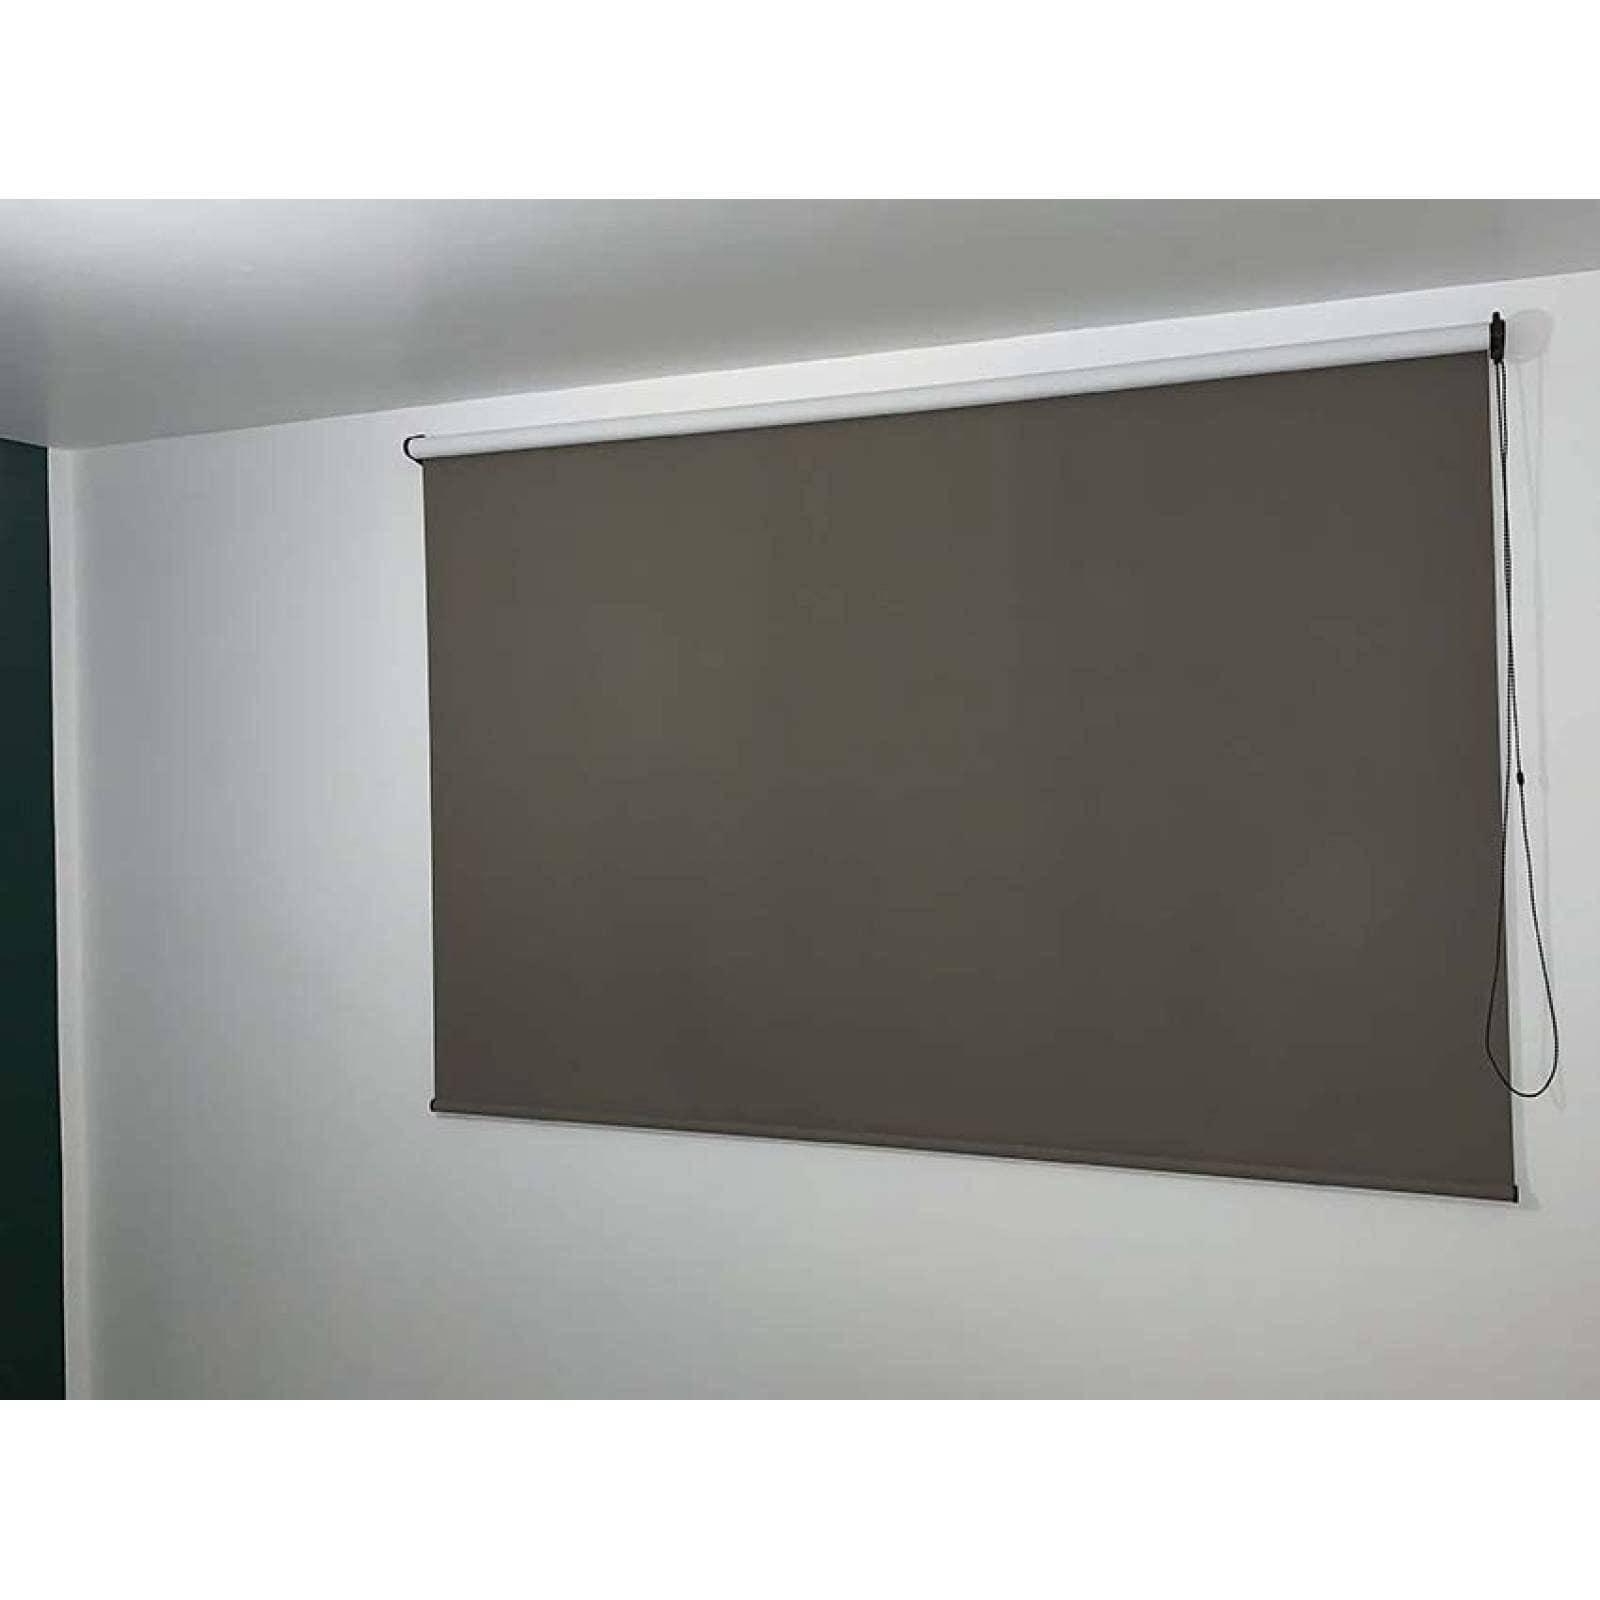 Persianas Blackout modelo Montreal 180 cm de ancho X hasta 150 cm de largo